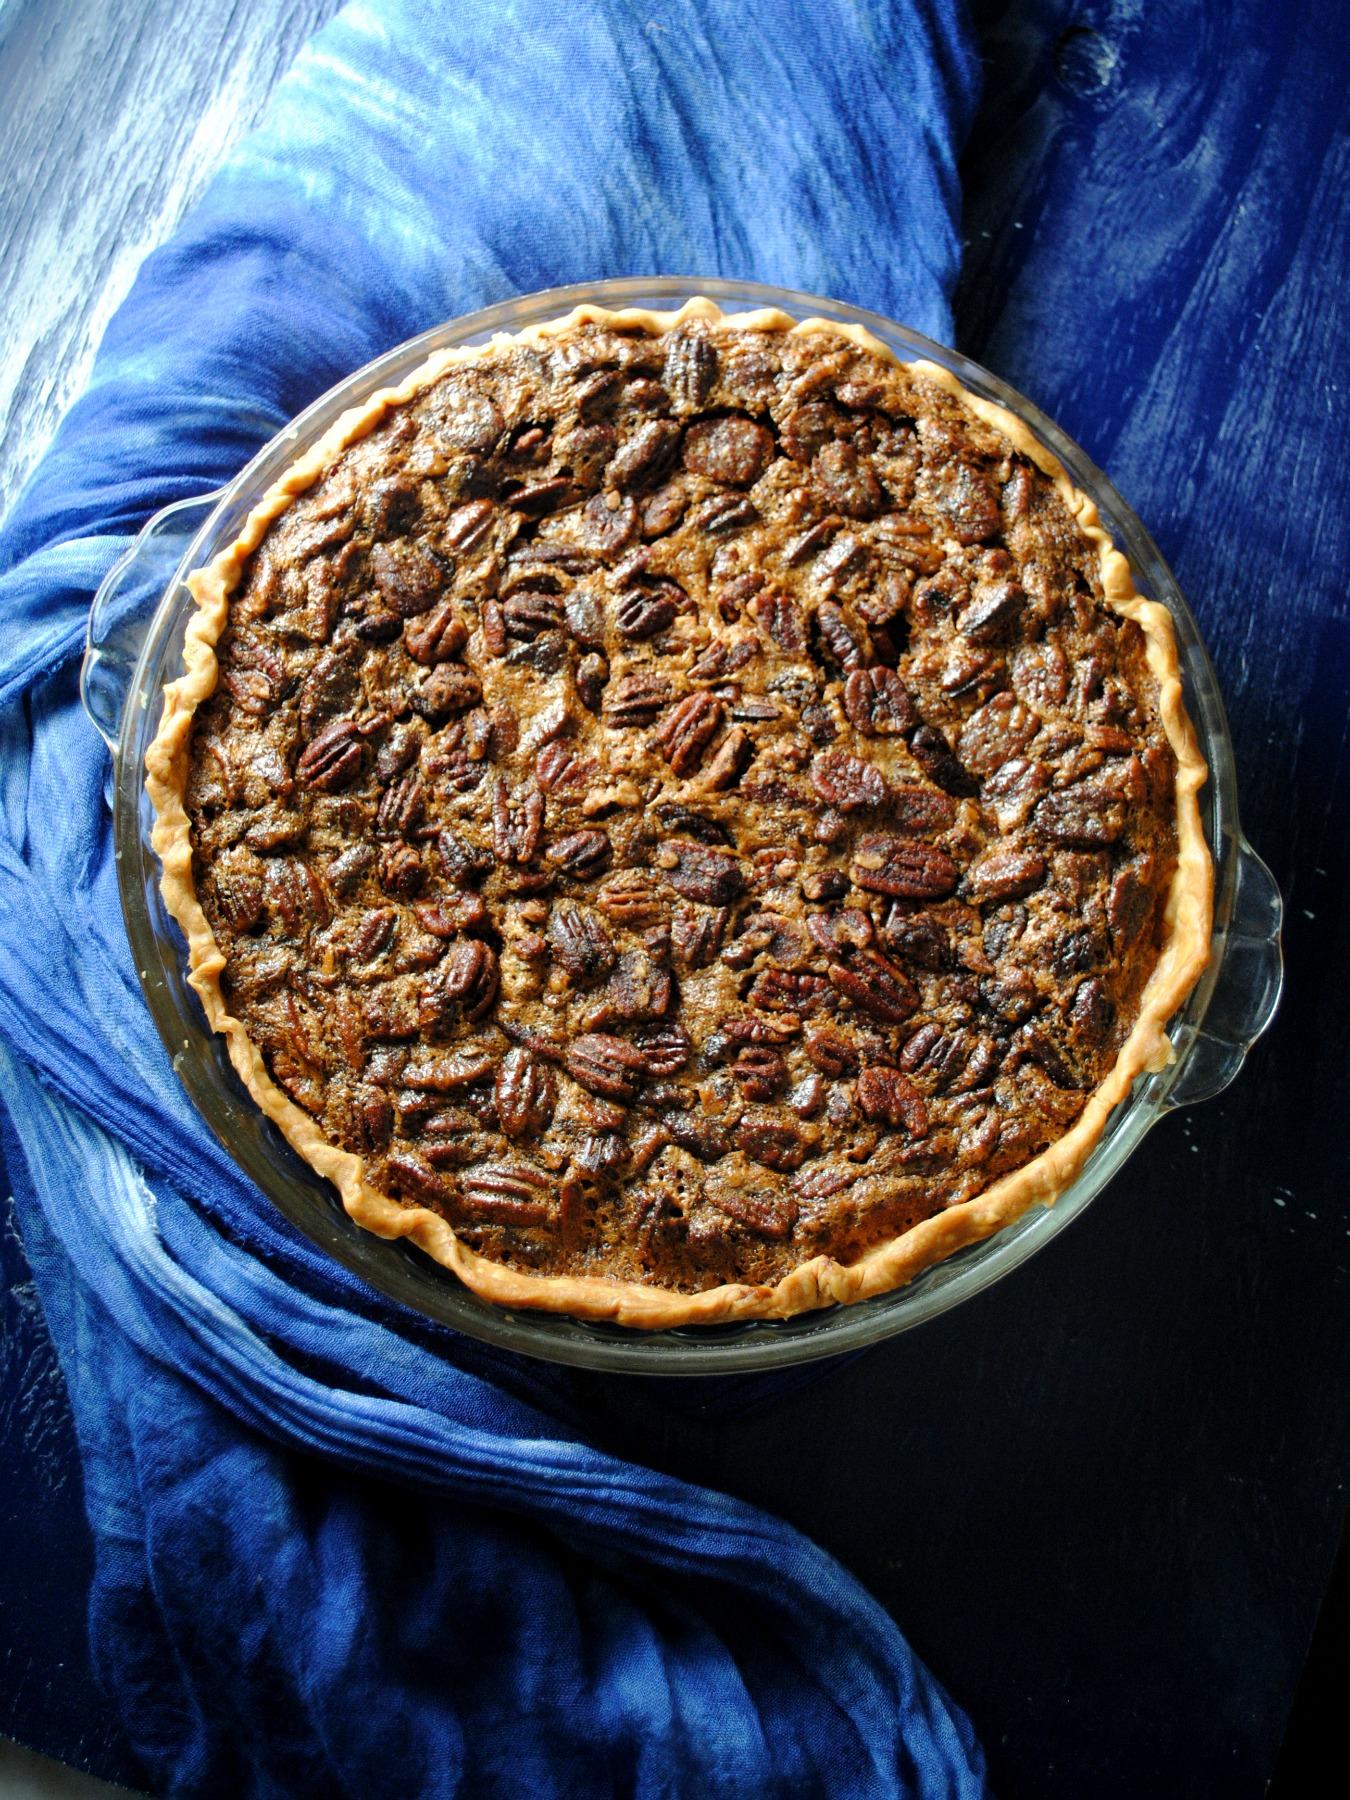 cinnamon-sugar-pecan-pie-VianneyRodriguez